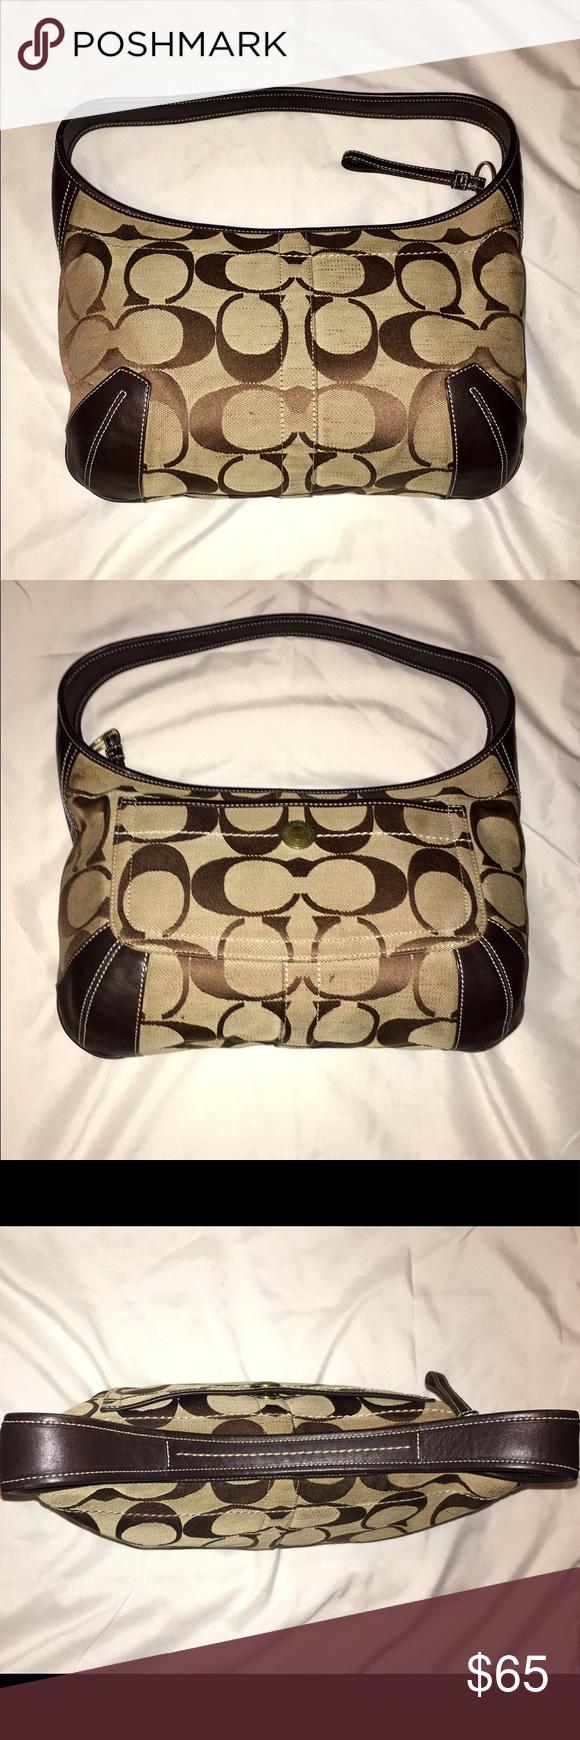 9ecf72dd7f3 Coach Signature Canvas and Leather Hobo Bag A Coach Soho signature hobo  style bag. This